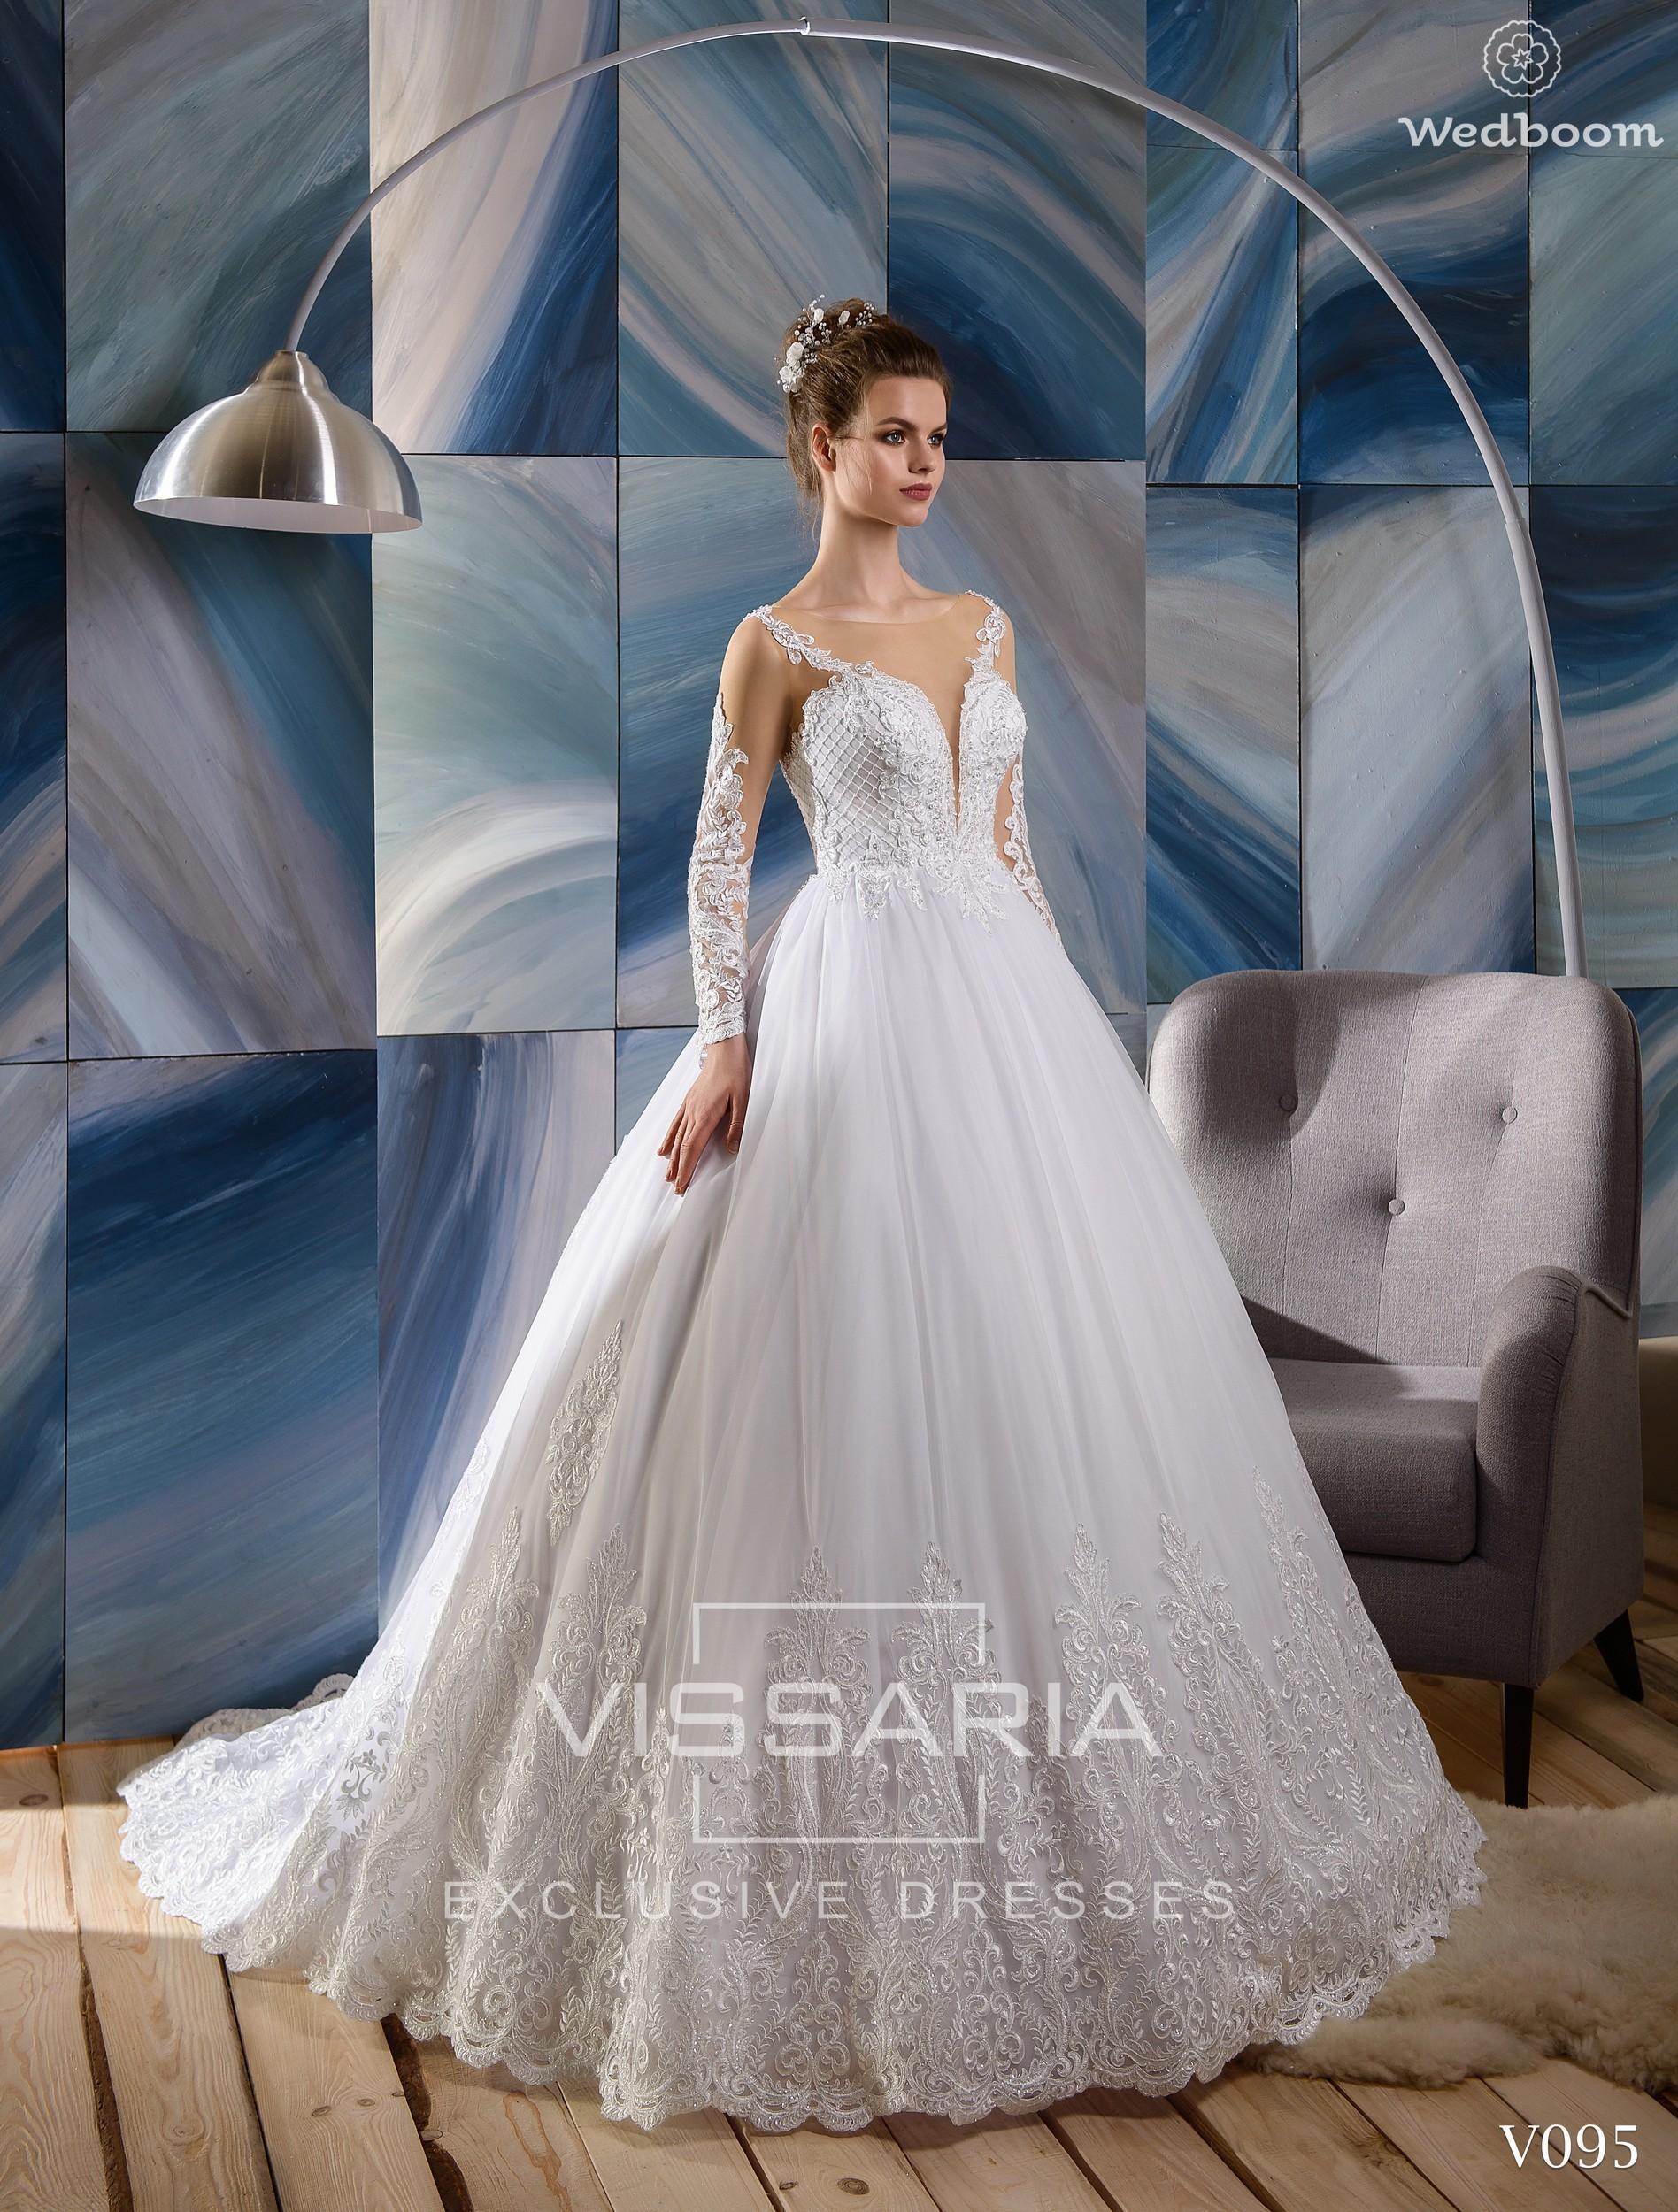 Wedding Dress Vissaria V20